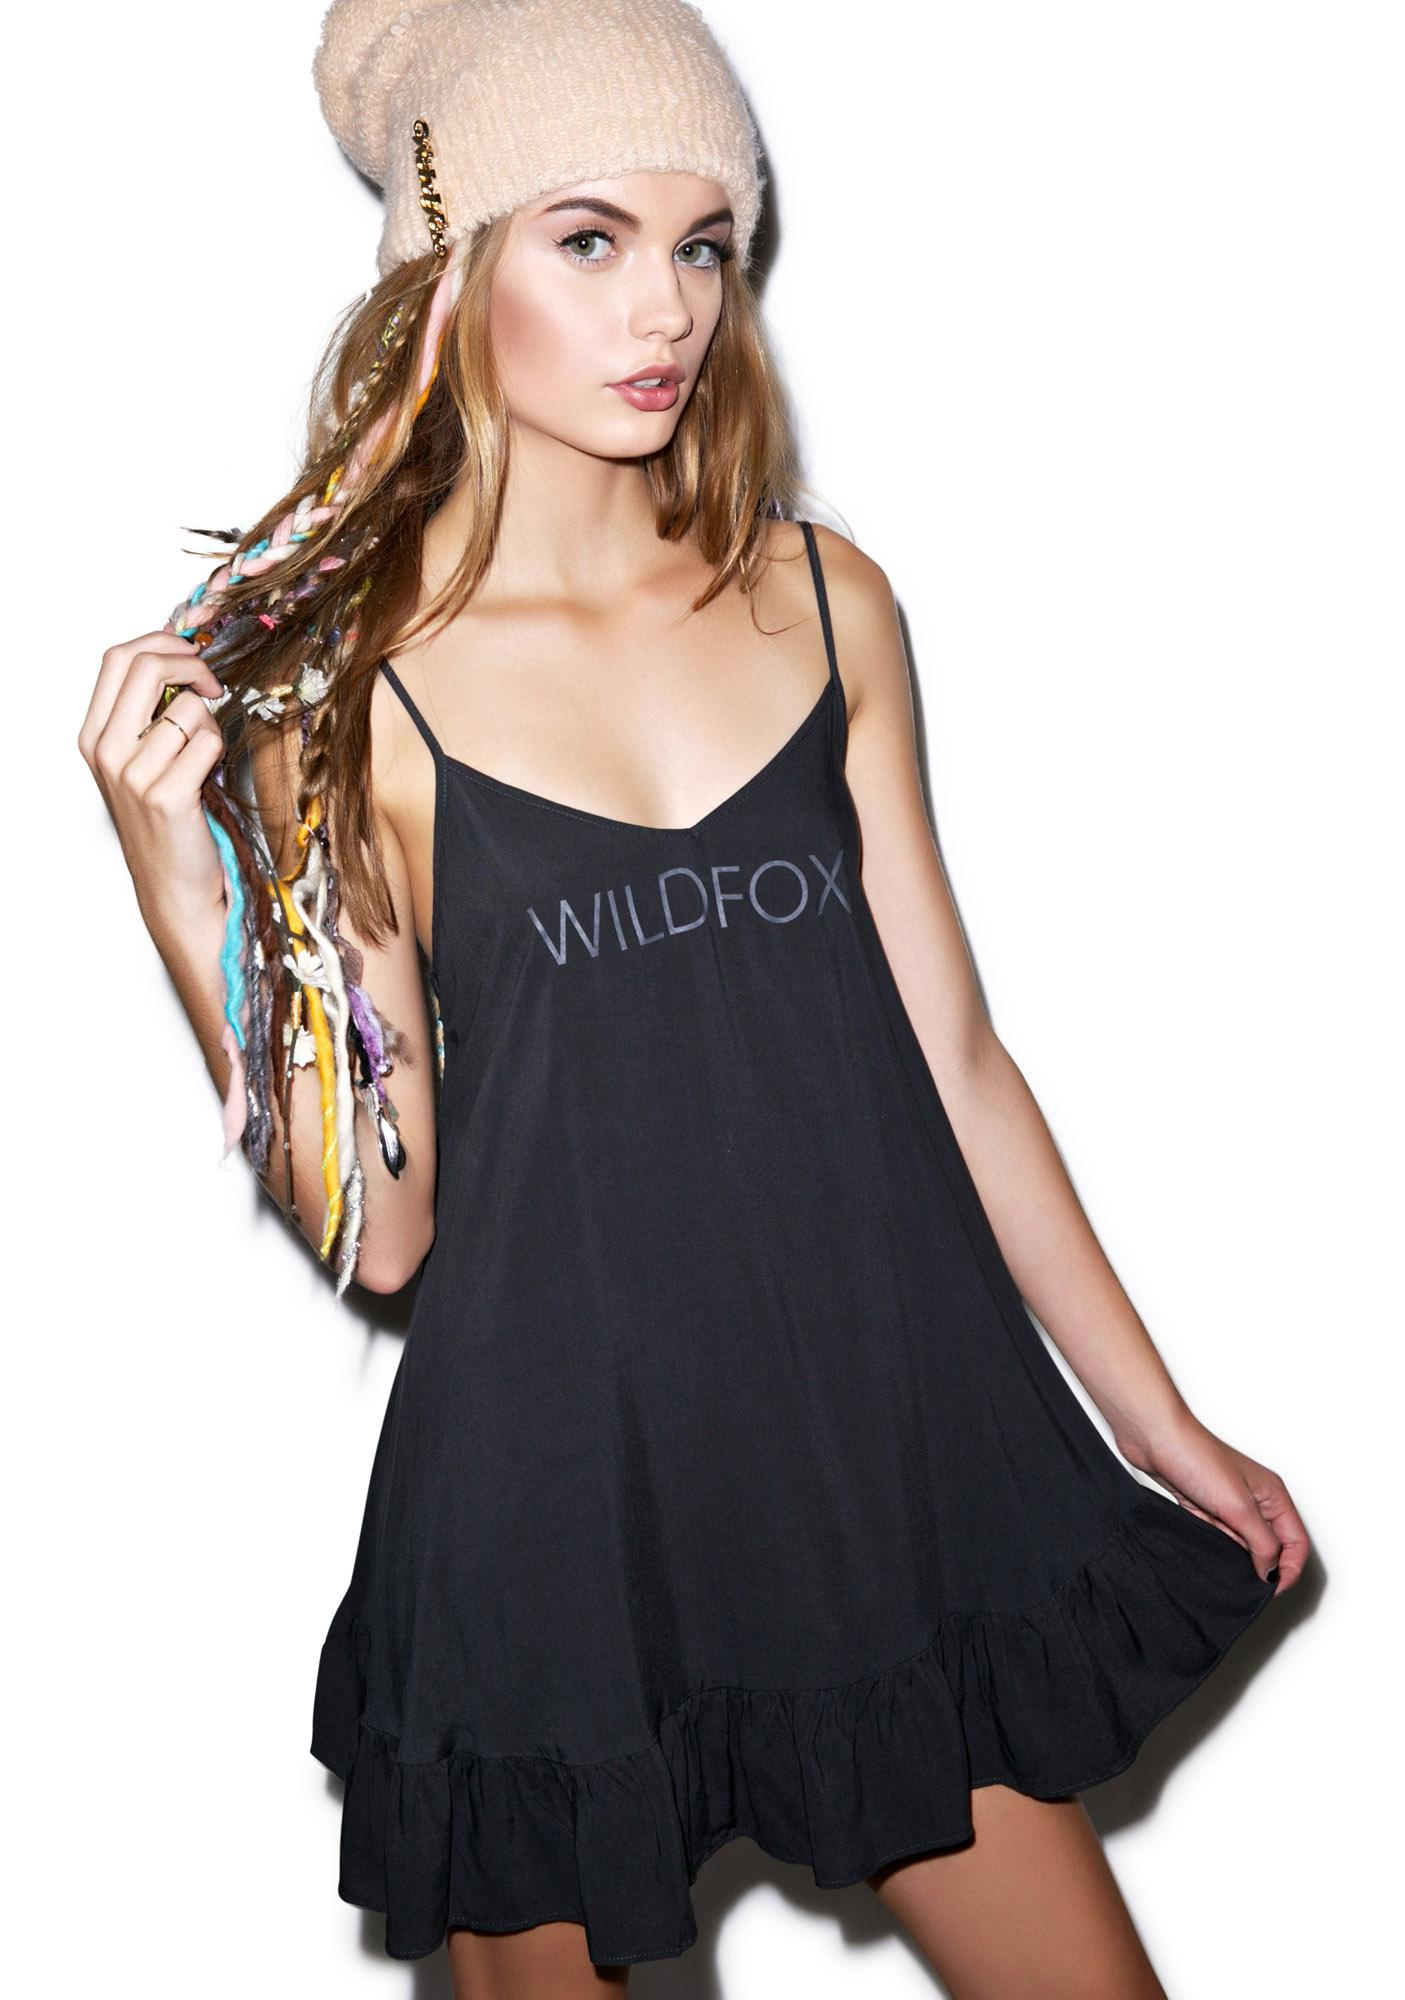 Wildfox Couture Wildfox Ruffle Corset Slip